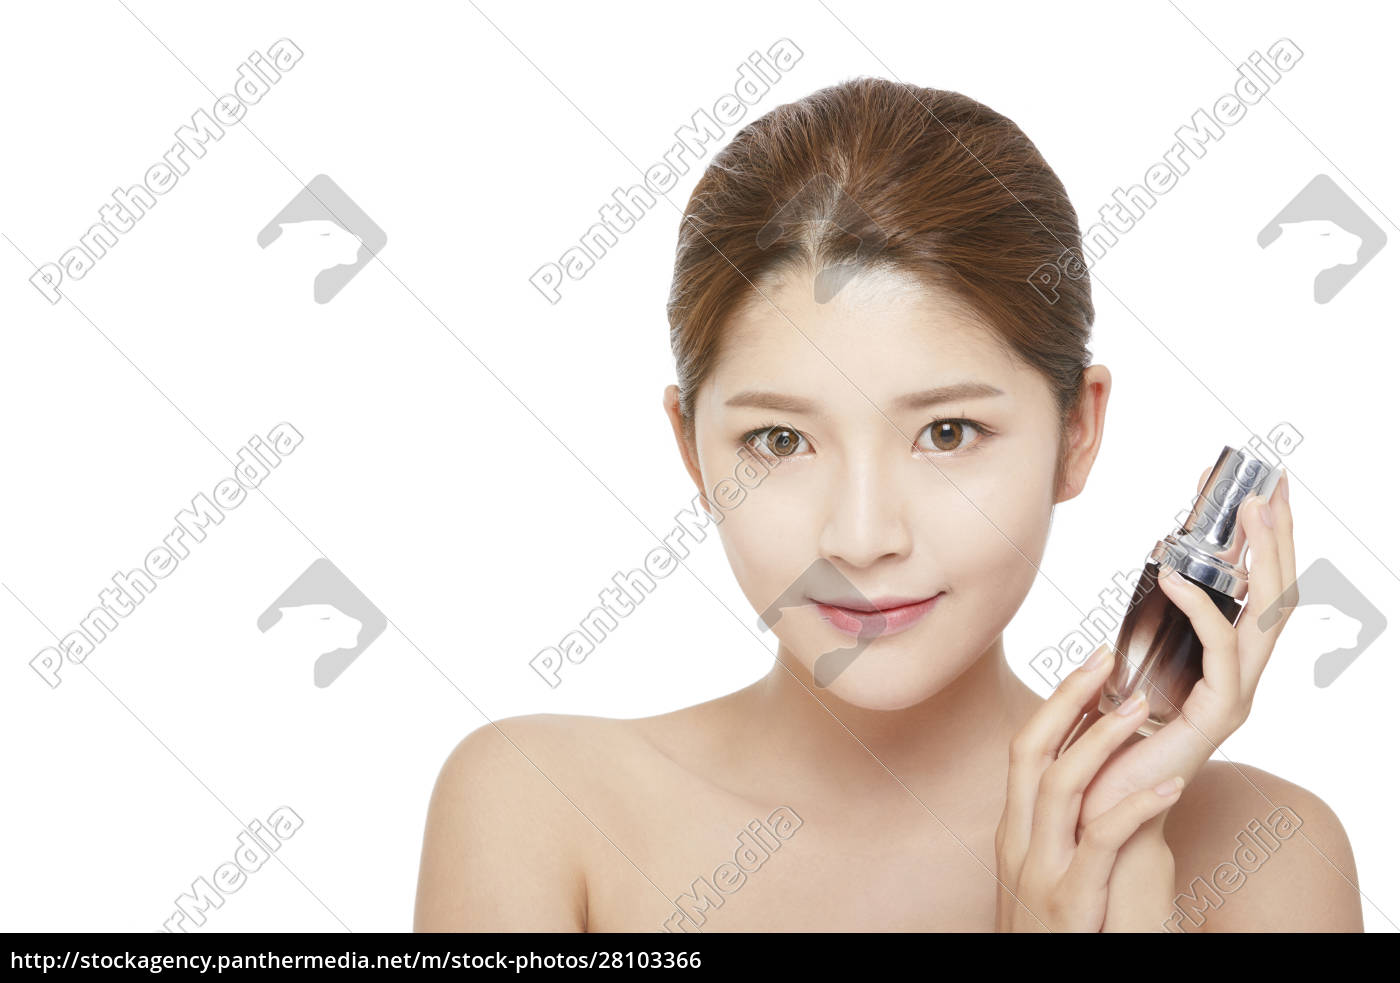 female, beauty, series - 28103366